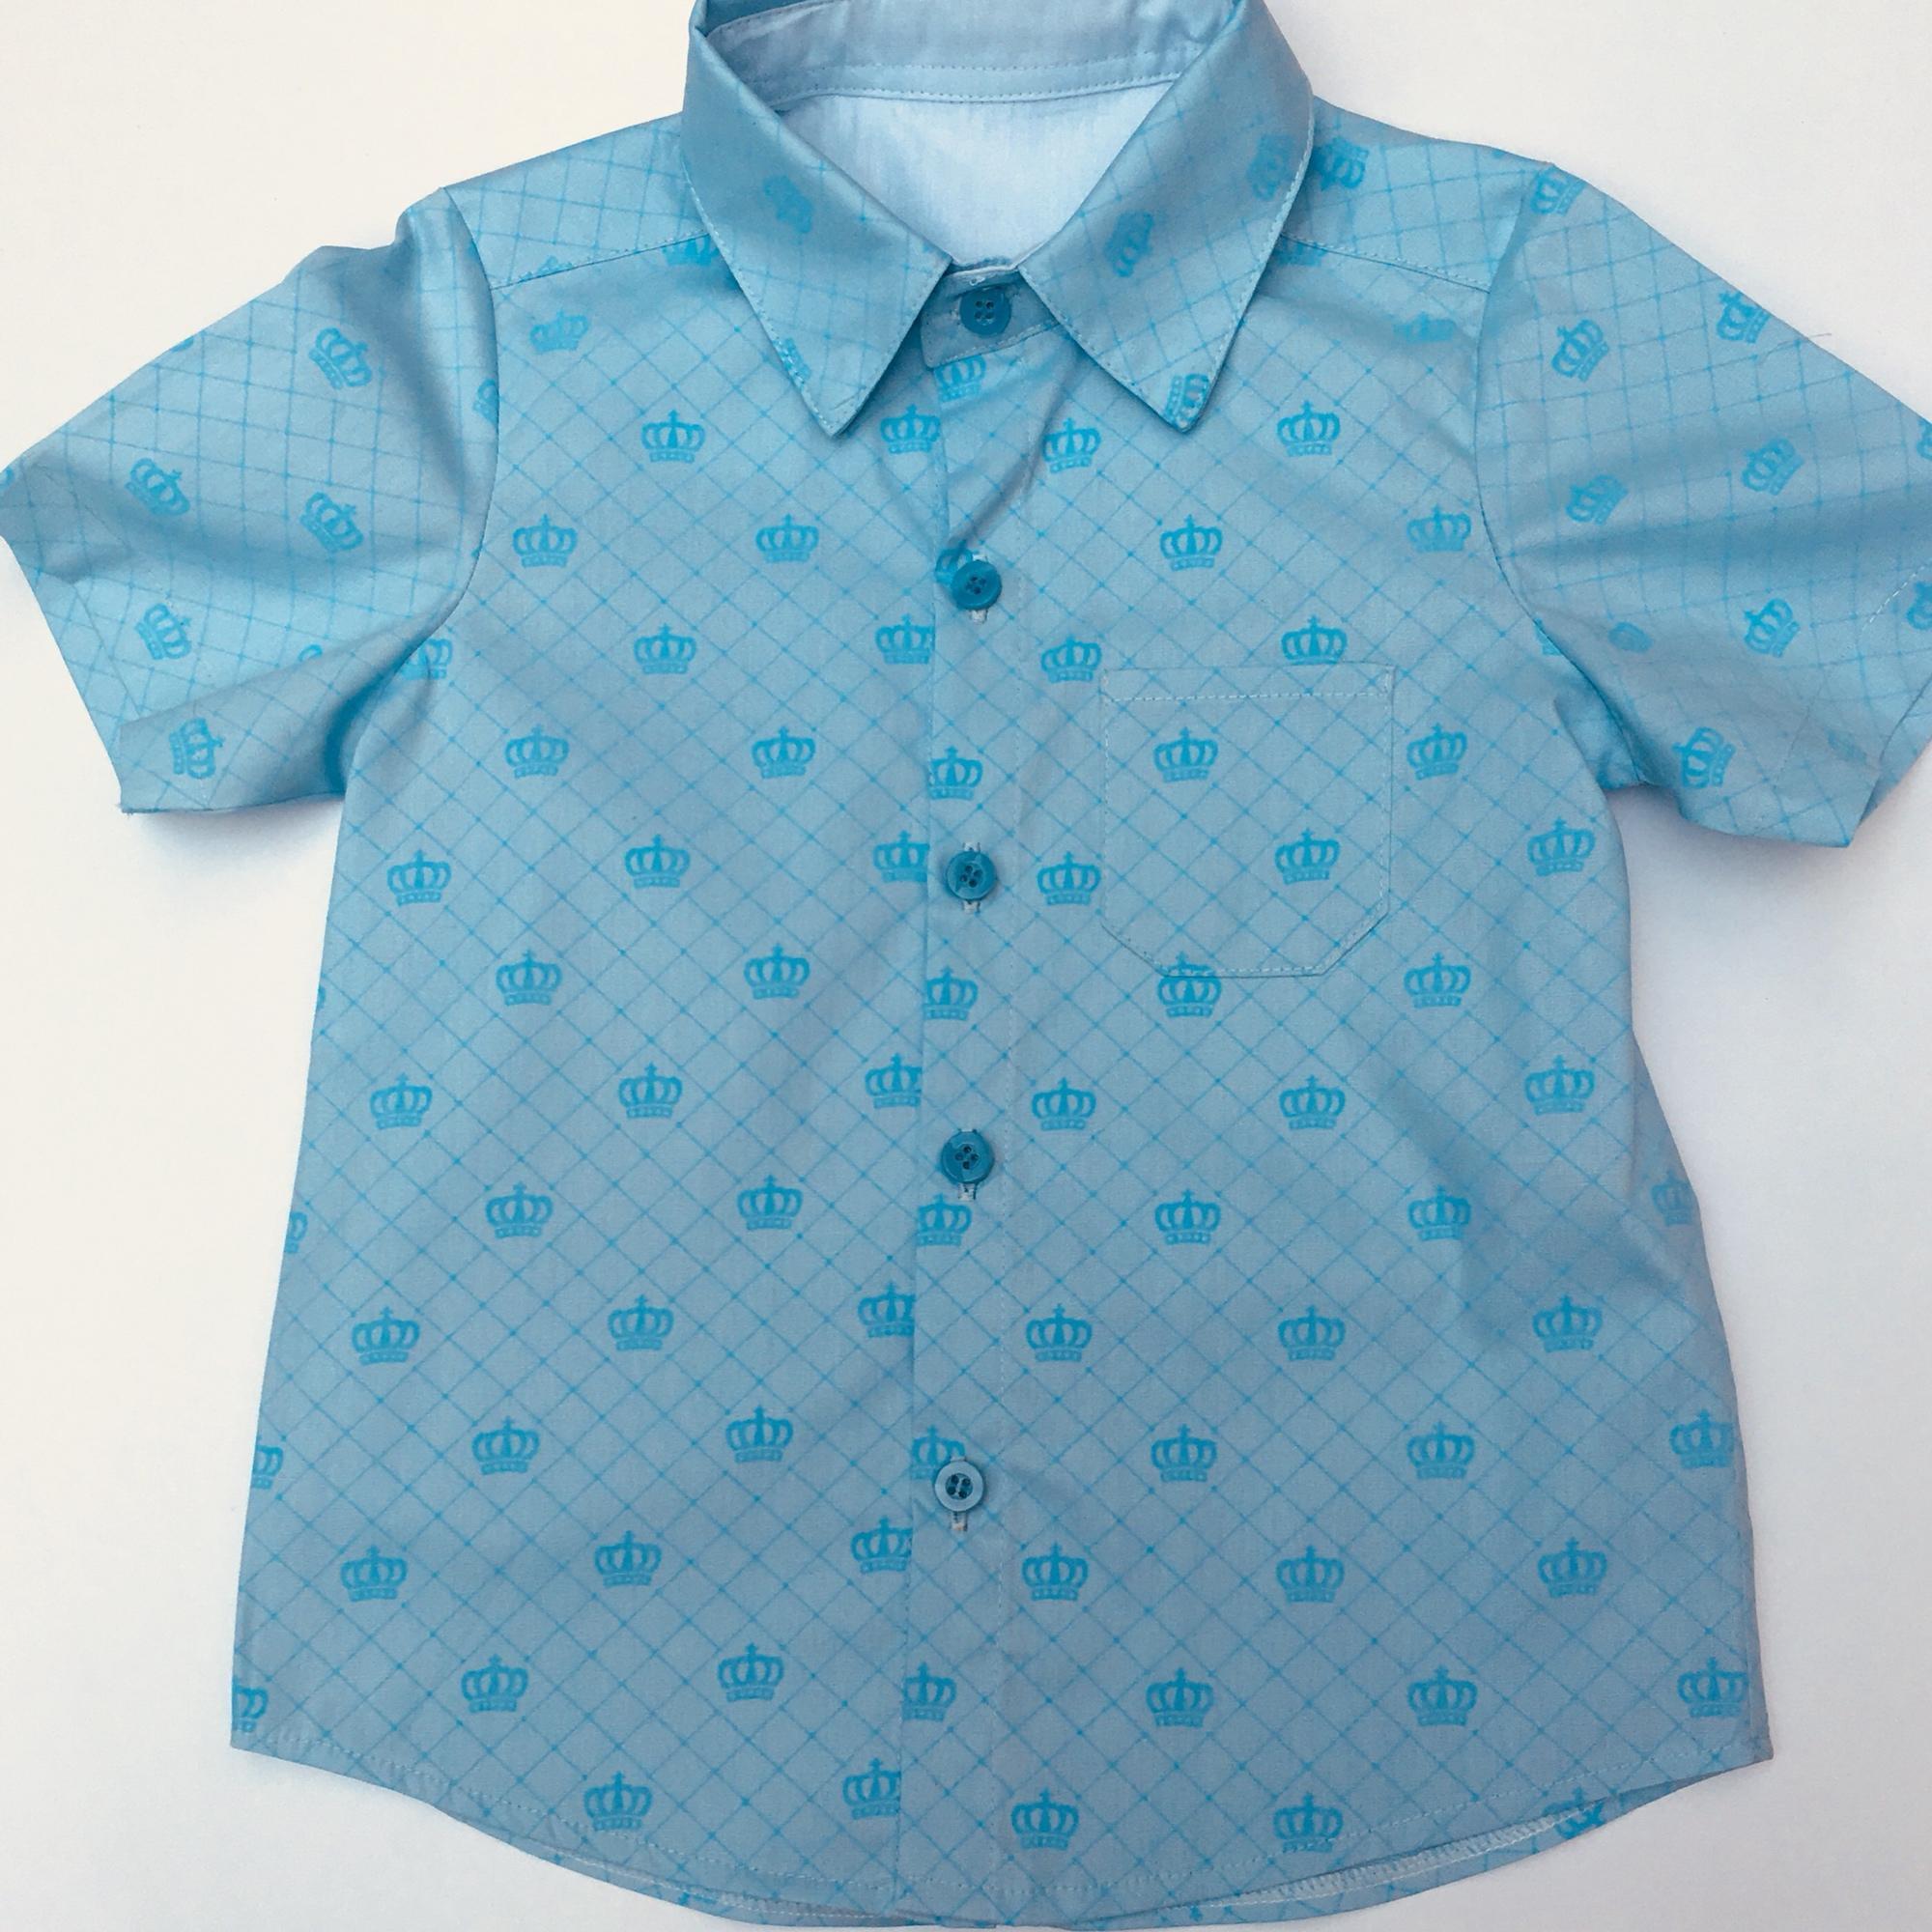 Coroa Azul Camisa  acef8b539e42e